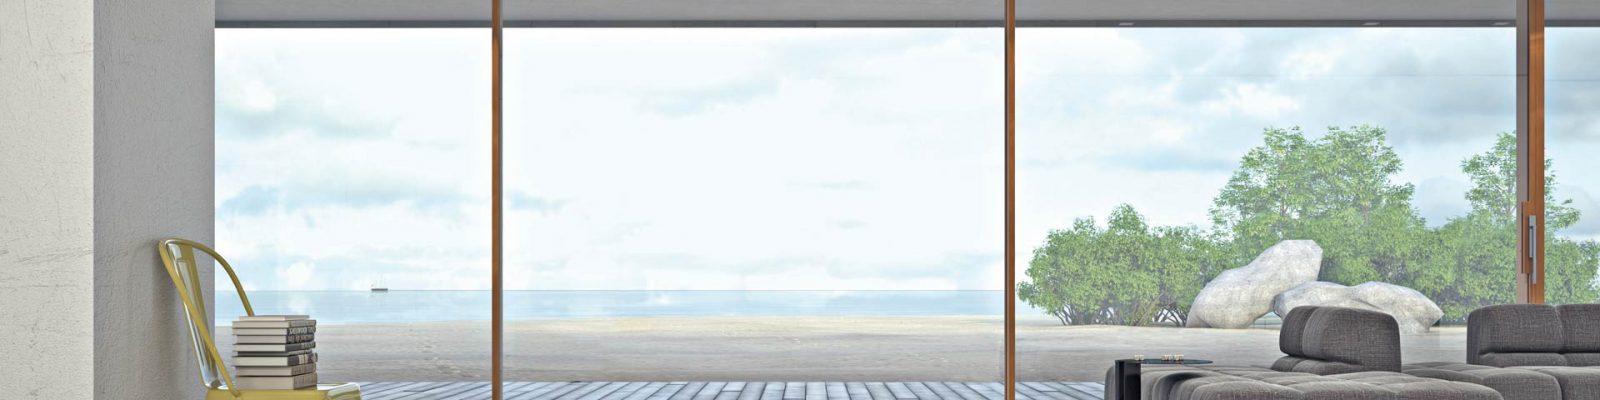 Skyline Drive, banner intermedio